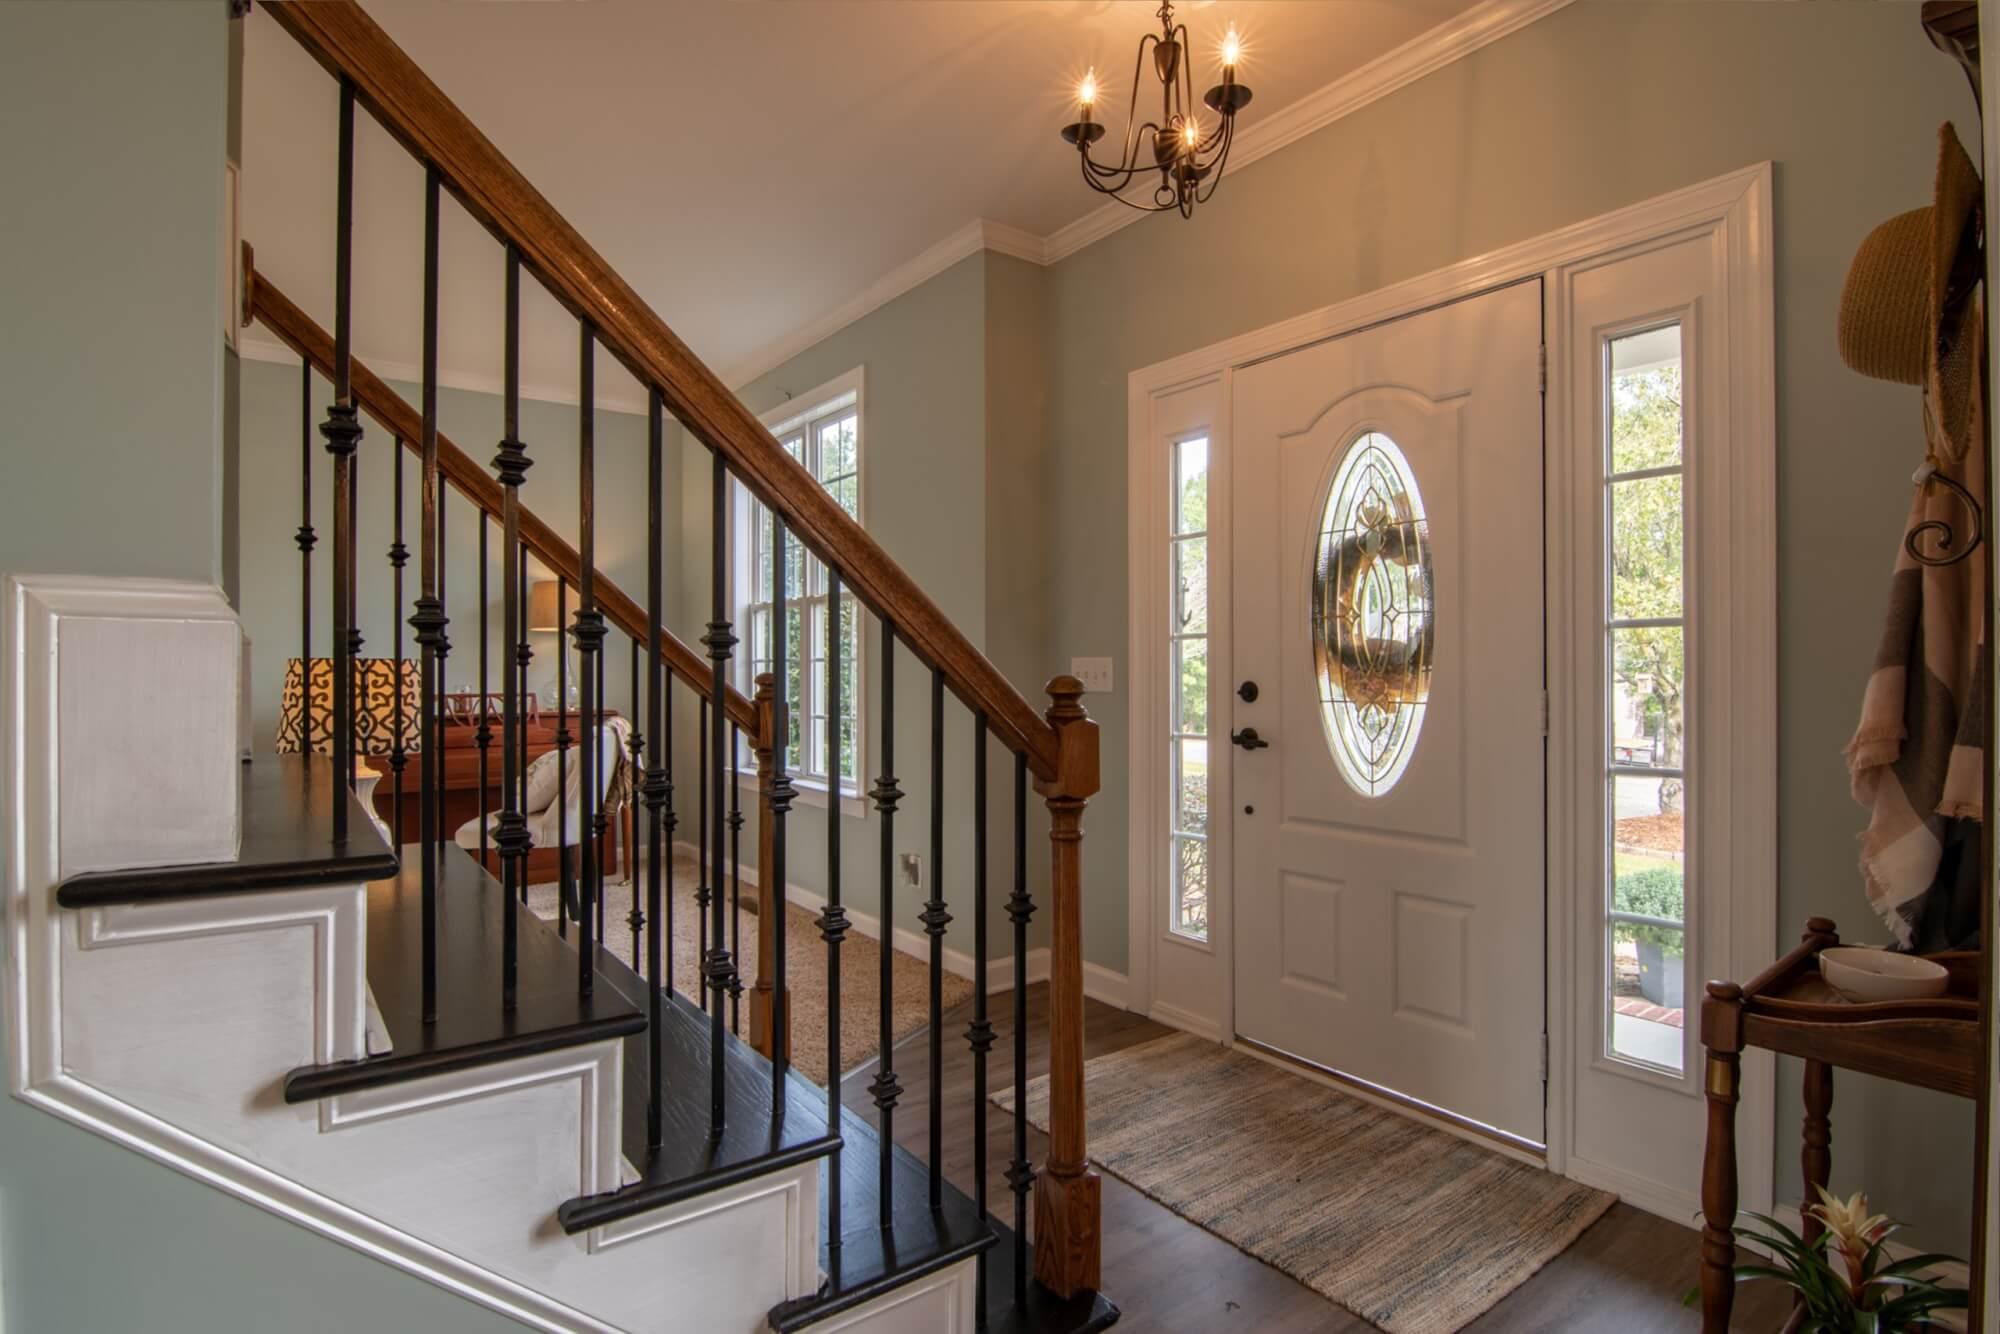 entrance with good interior design